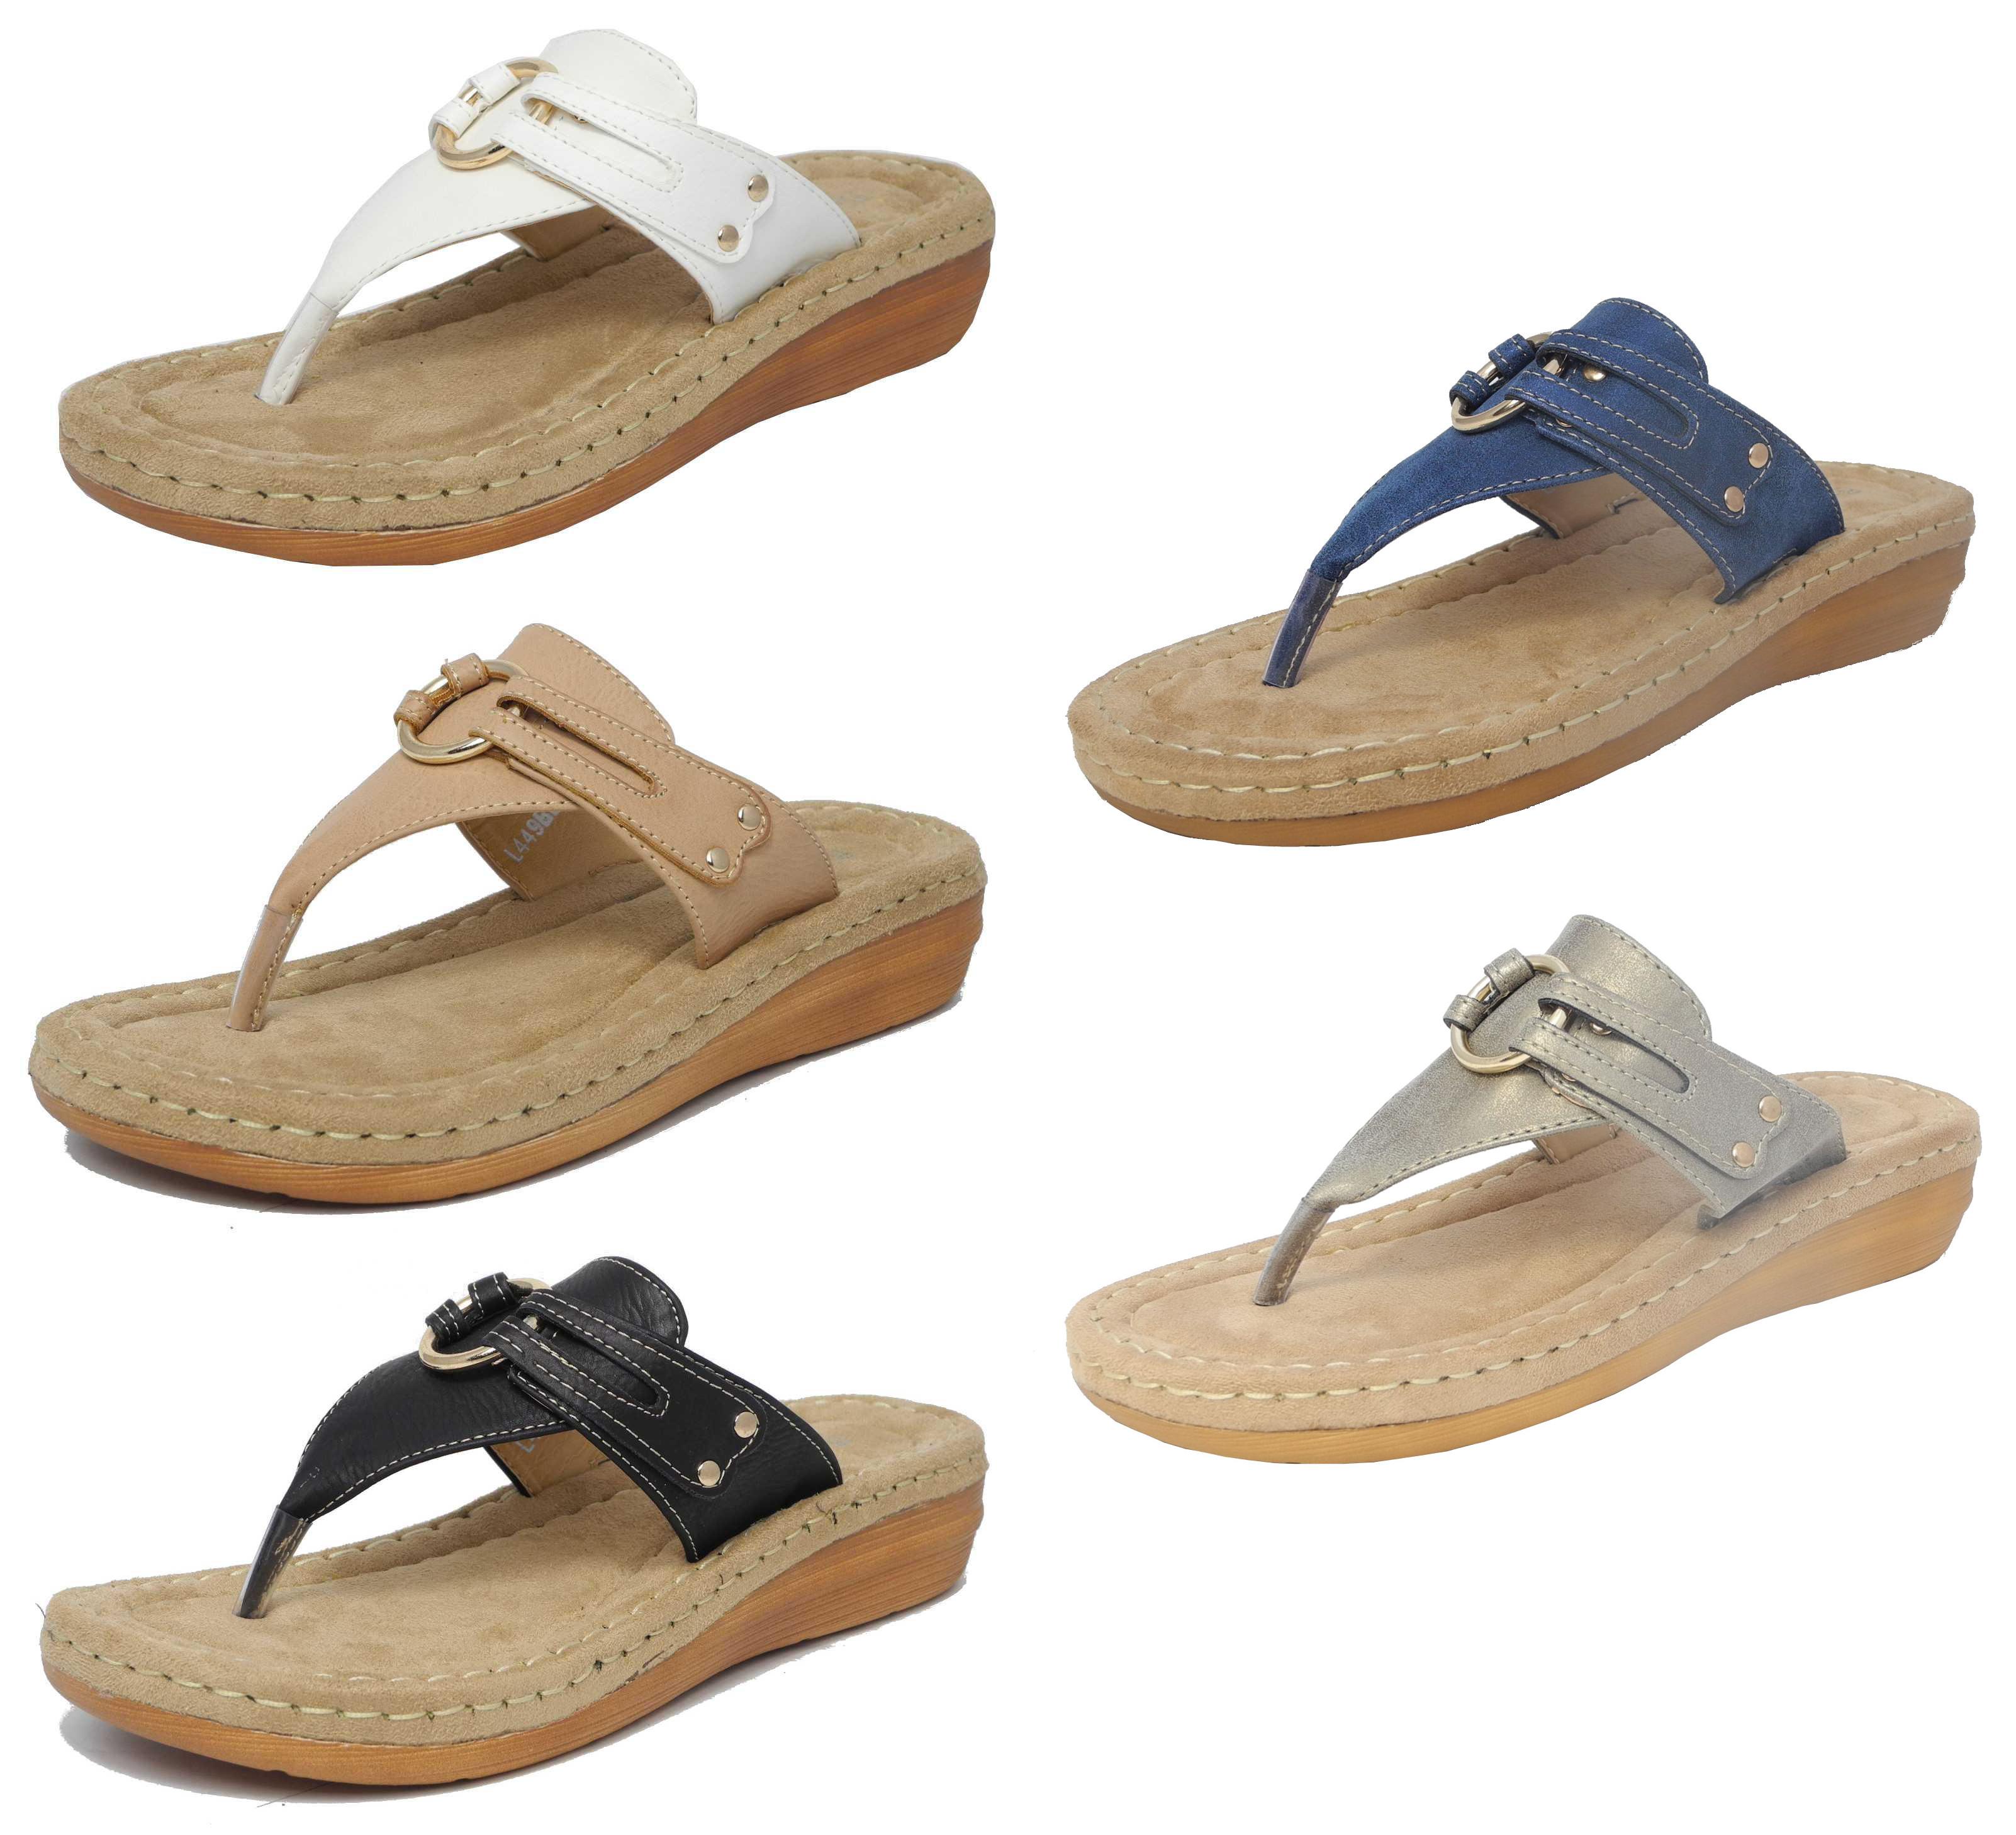 0a7f5738d05af Womens Ladies Leather Look Toe Post Flip Flops Cushion Comfort Sandals Size  3-8